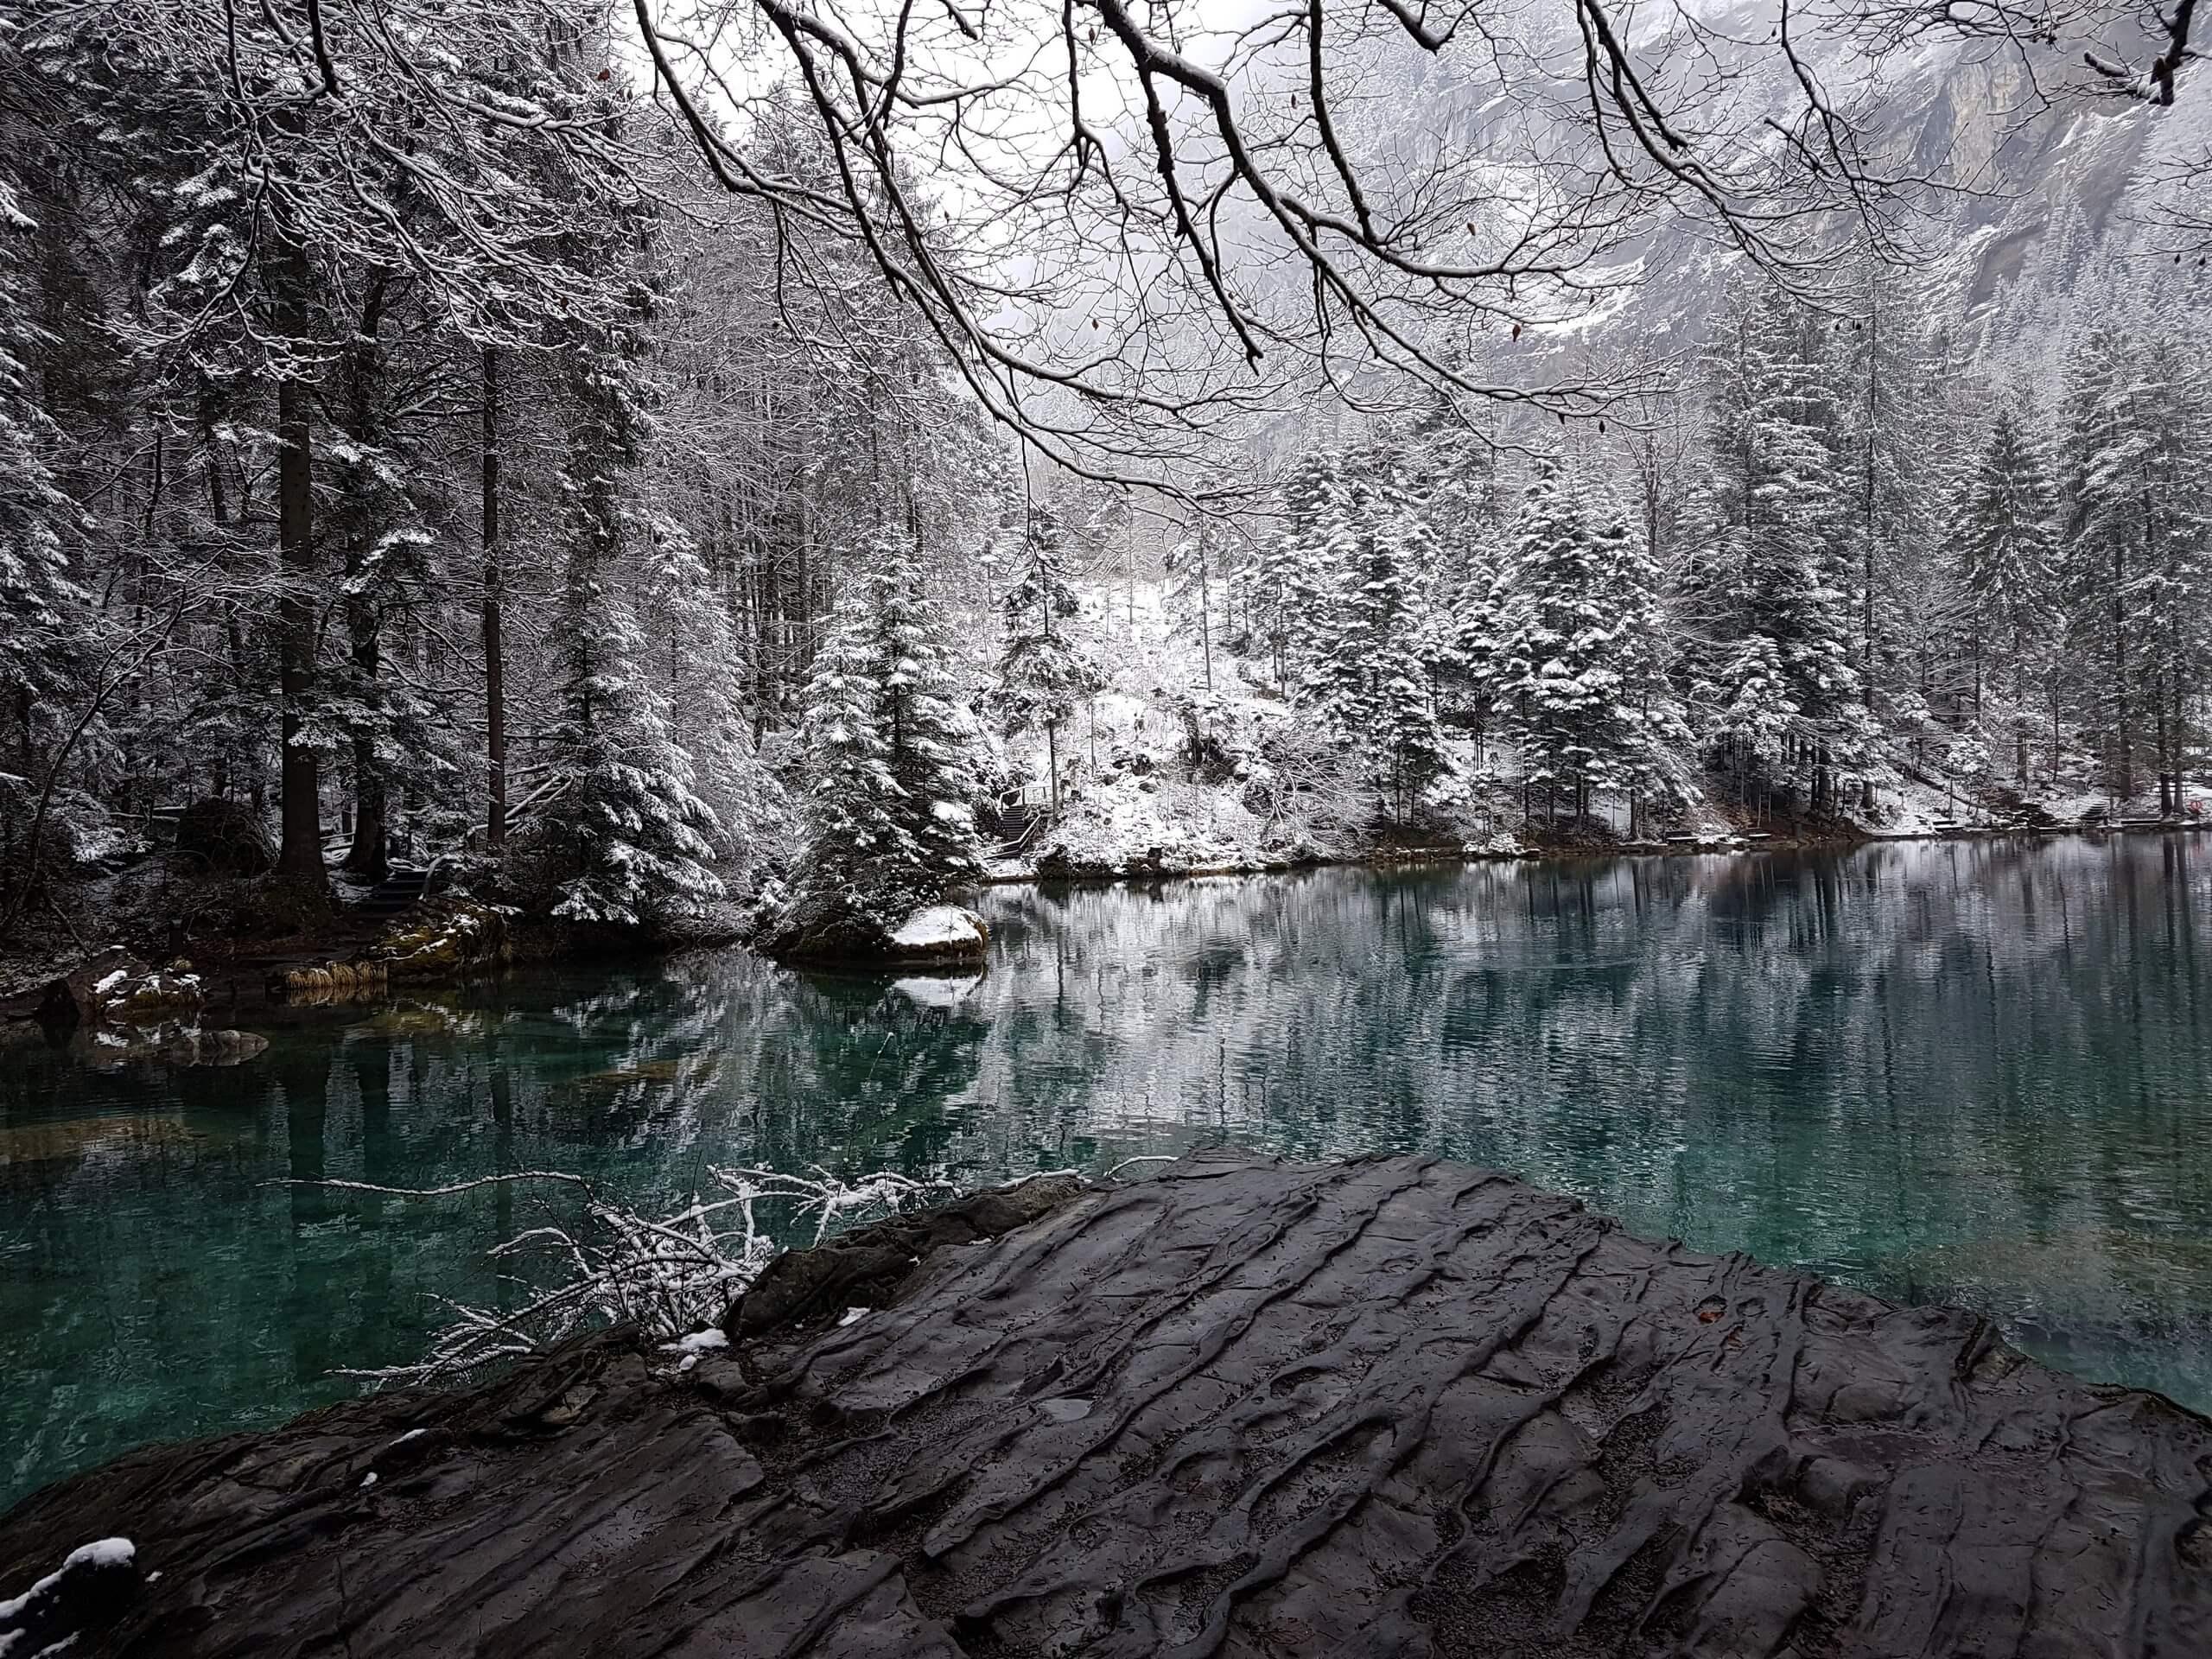 interlaken-privatetour-pure-switzerland-winter-see